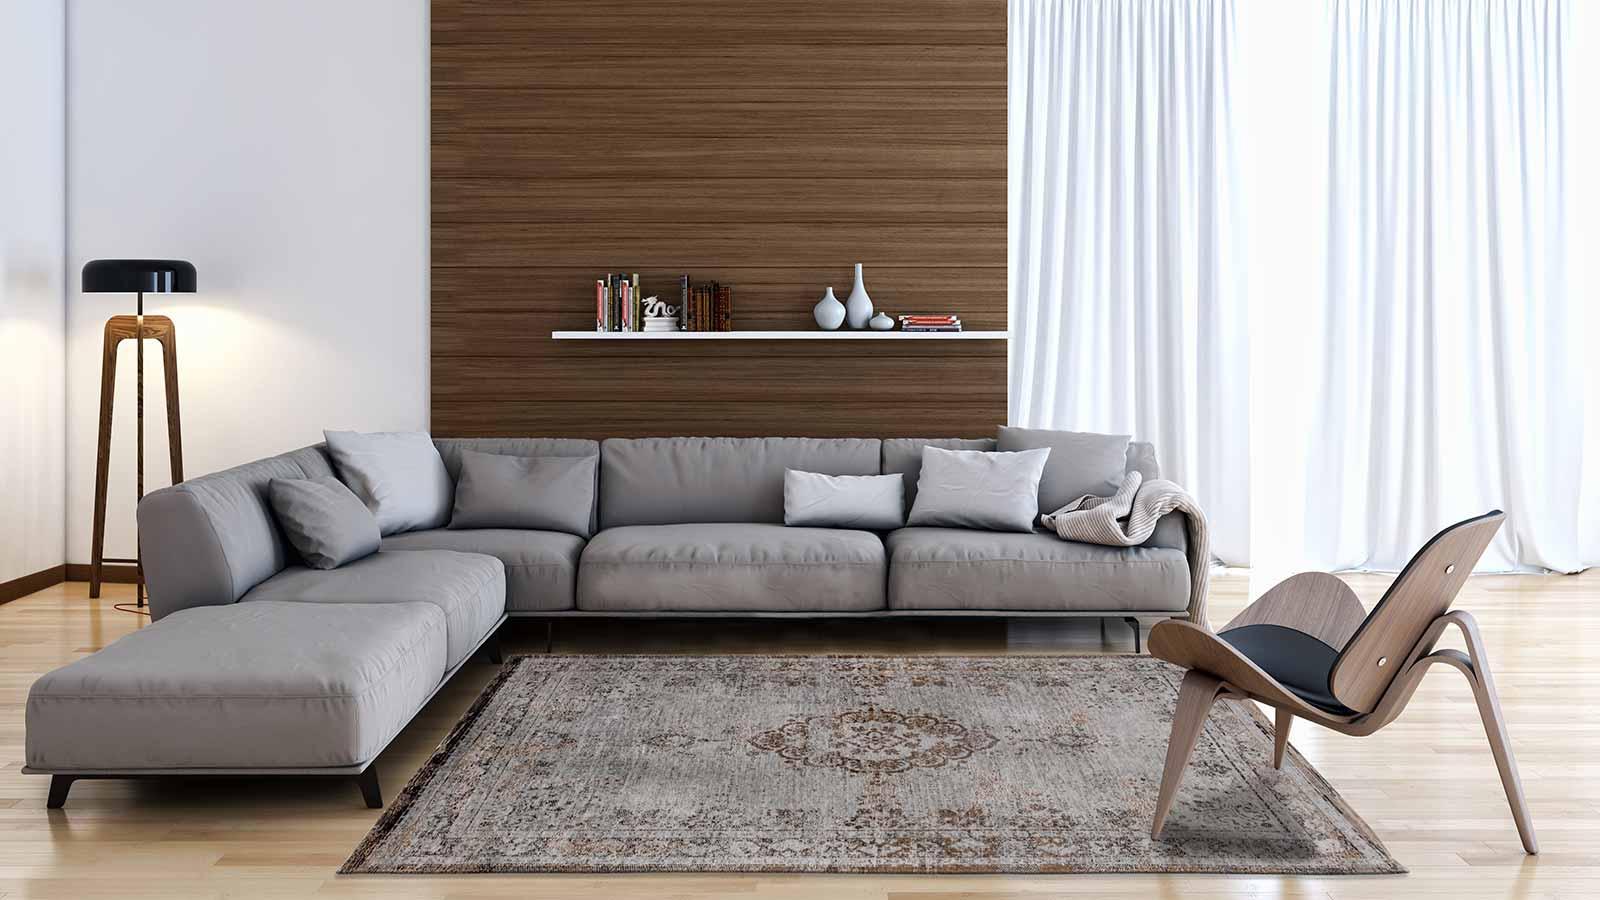 teppich Louis De Poortere LX 8257 Fading World Medaillon Grey Ebony interior